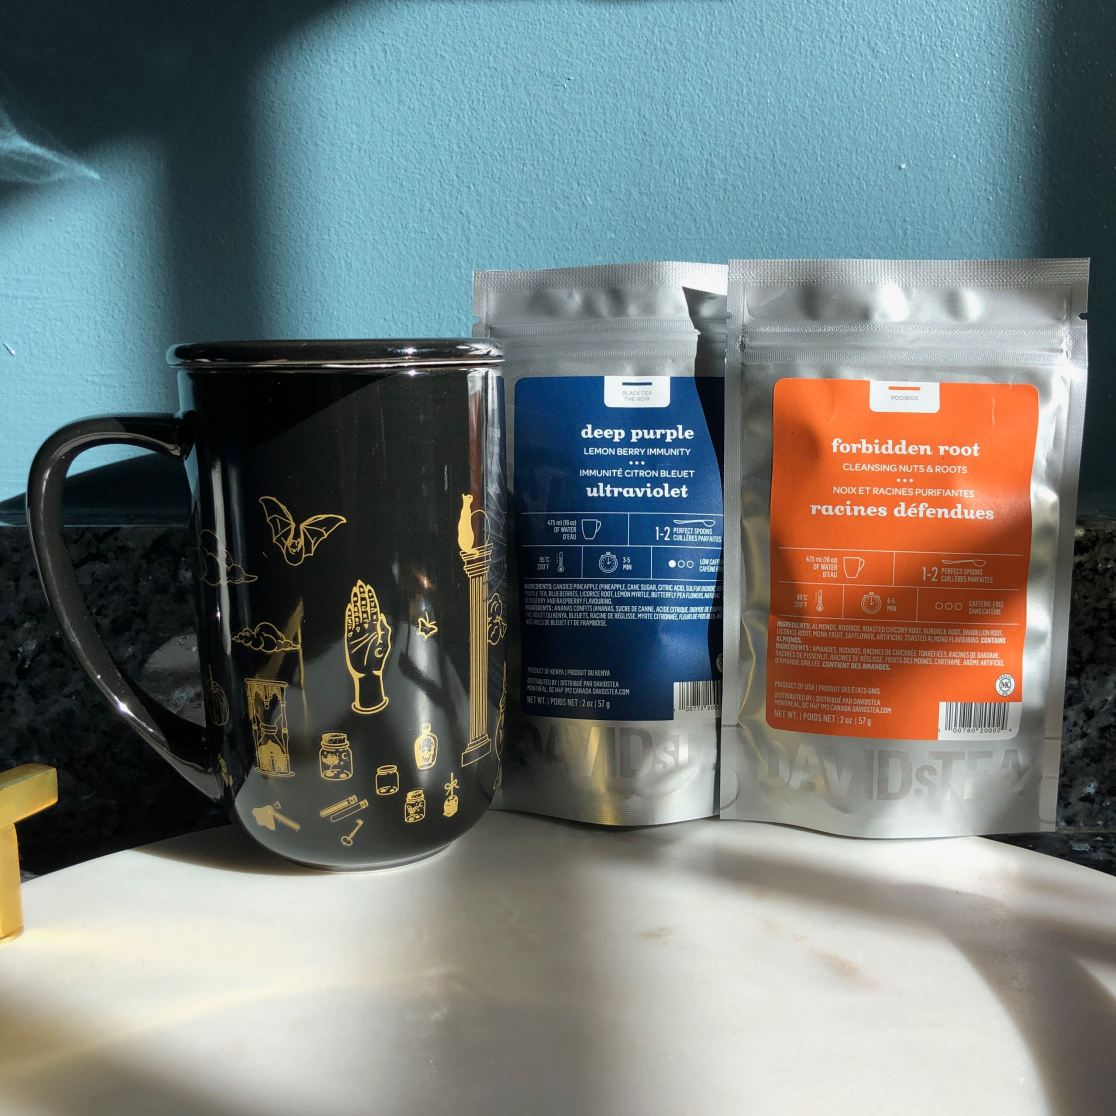 David's Tea Fall Collection